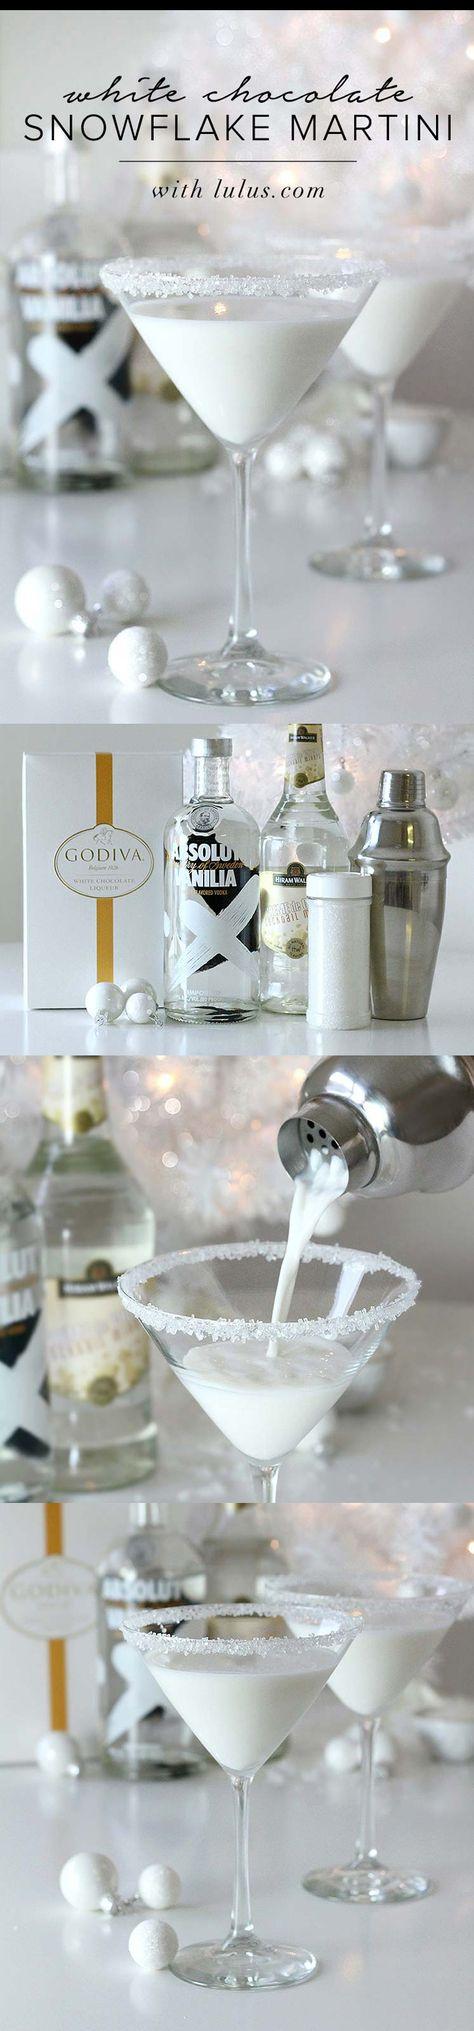 #Interesting Godiva white chocolate liquor, vanilla vodka and white creme de cocoa. I. MUST. TRY.